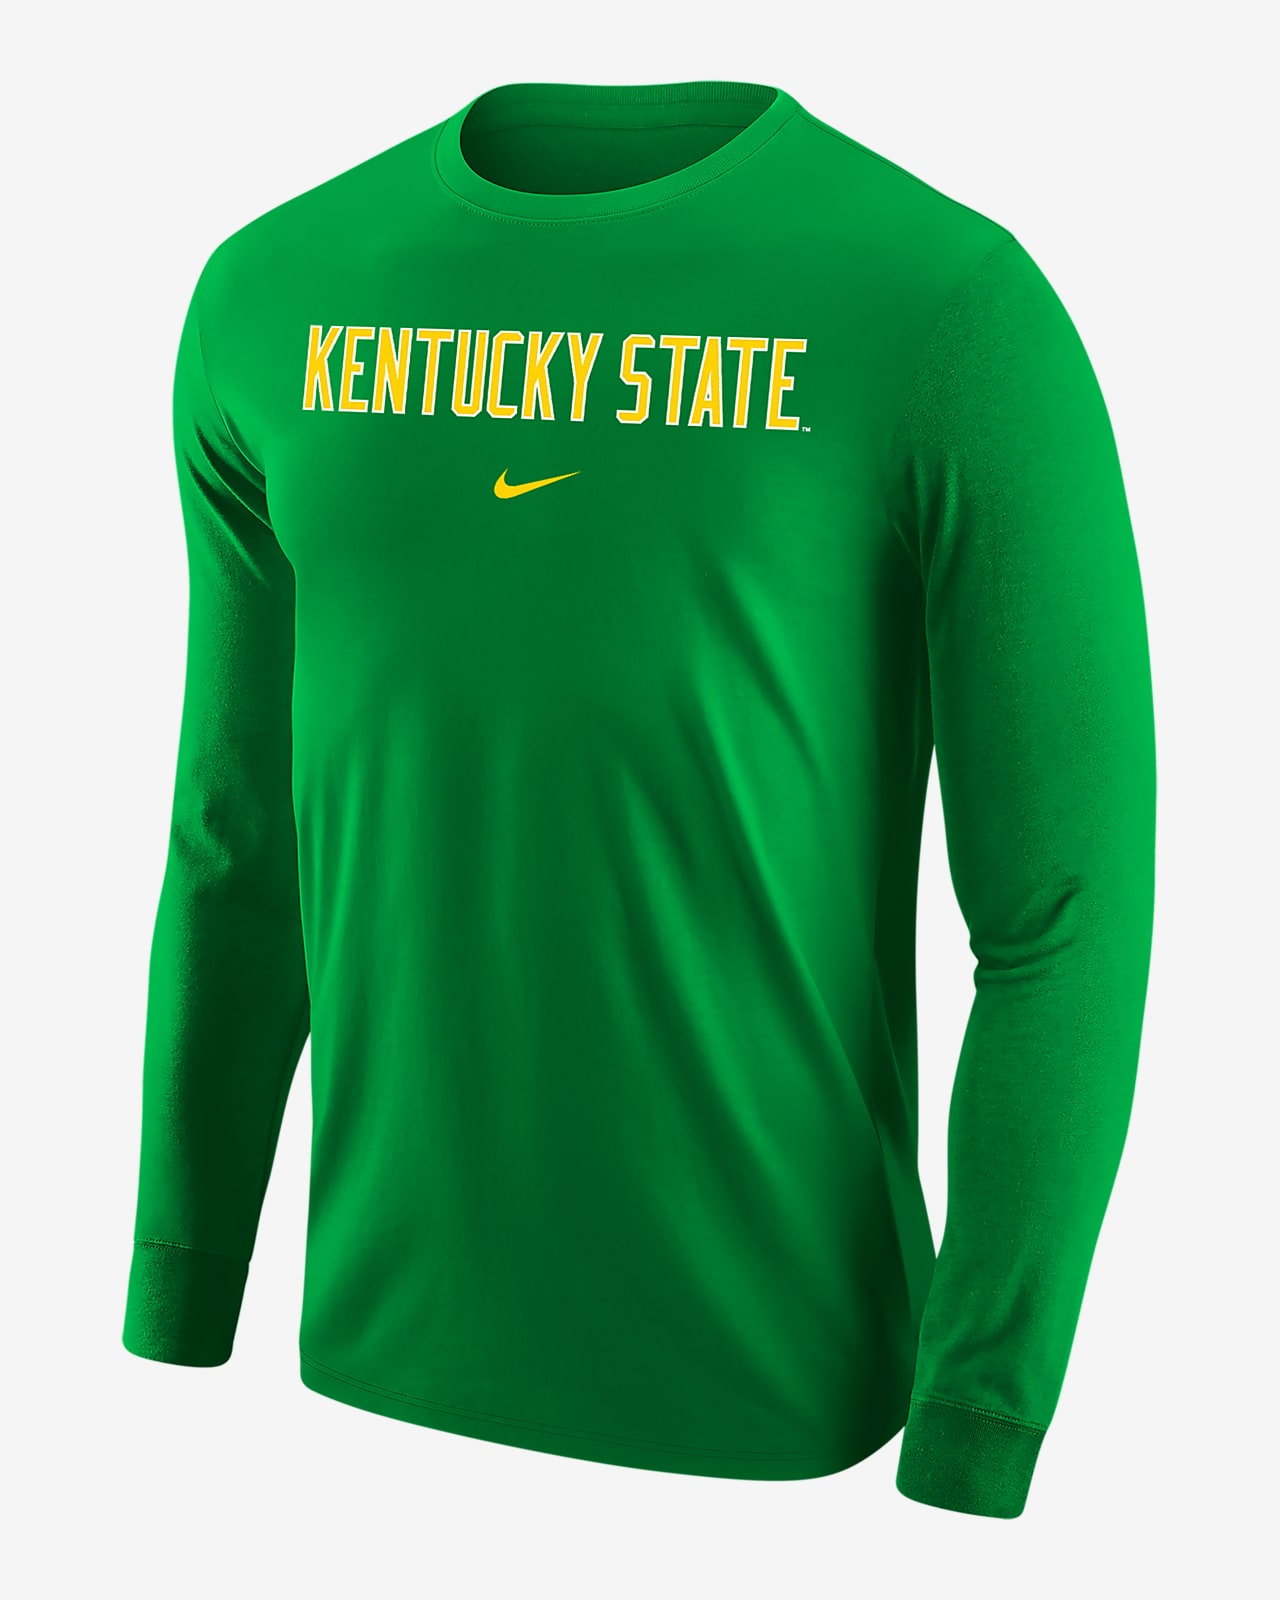 Nike College (Kentucky State) Men's Long-Sleeve T-Shirt